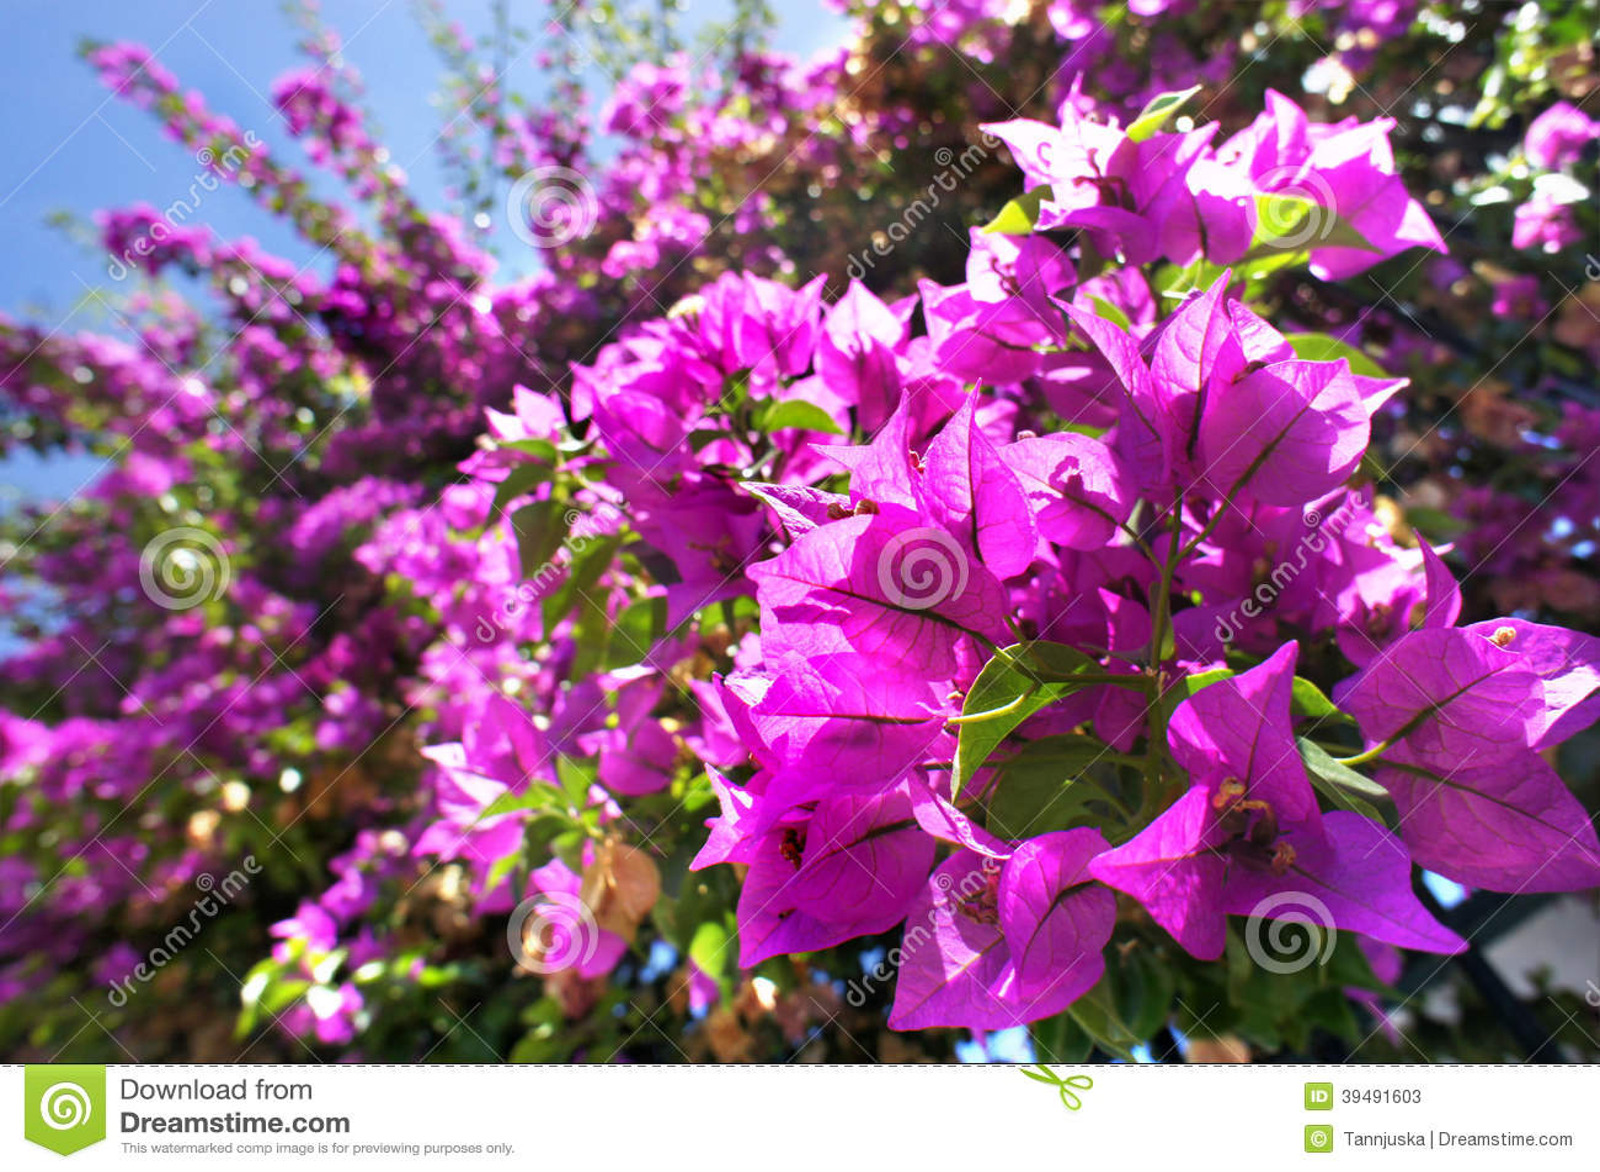 belle terrasse m diterran enne avec les fleurs roses photo stock image 39491603. Black Bedroom Furniture Sets. Home Design Ideas